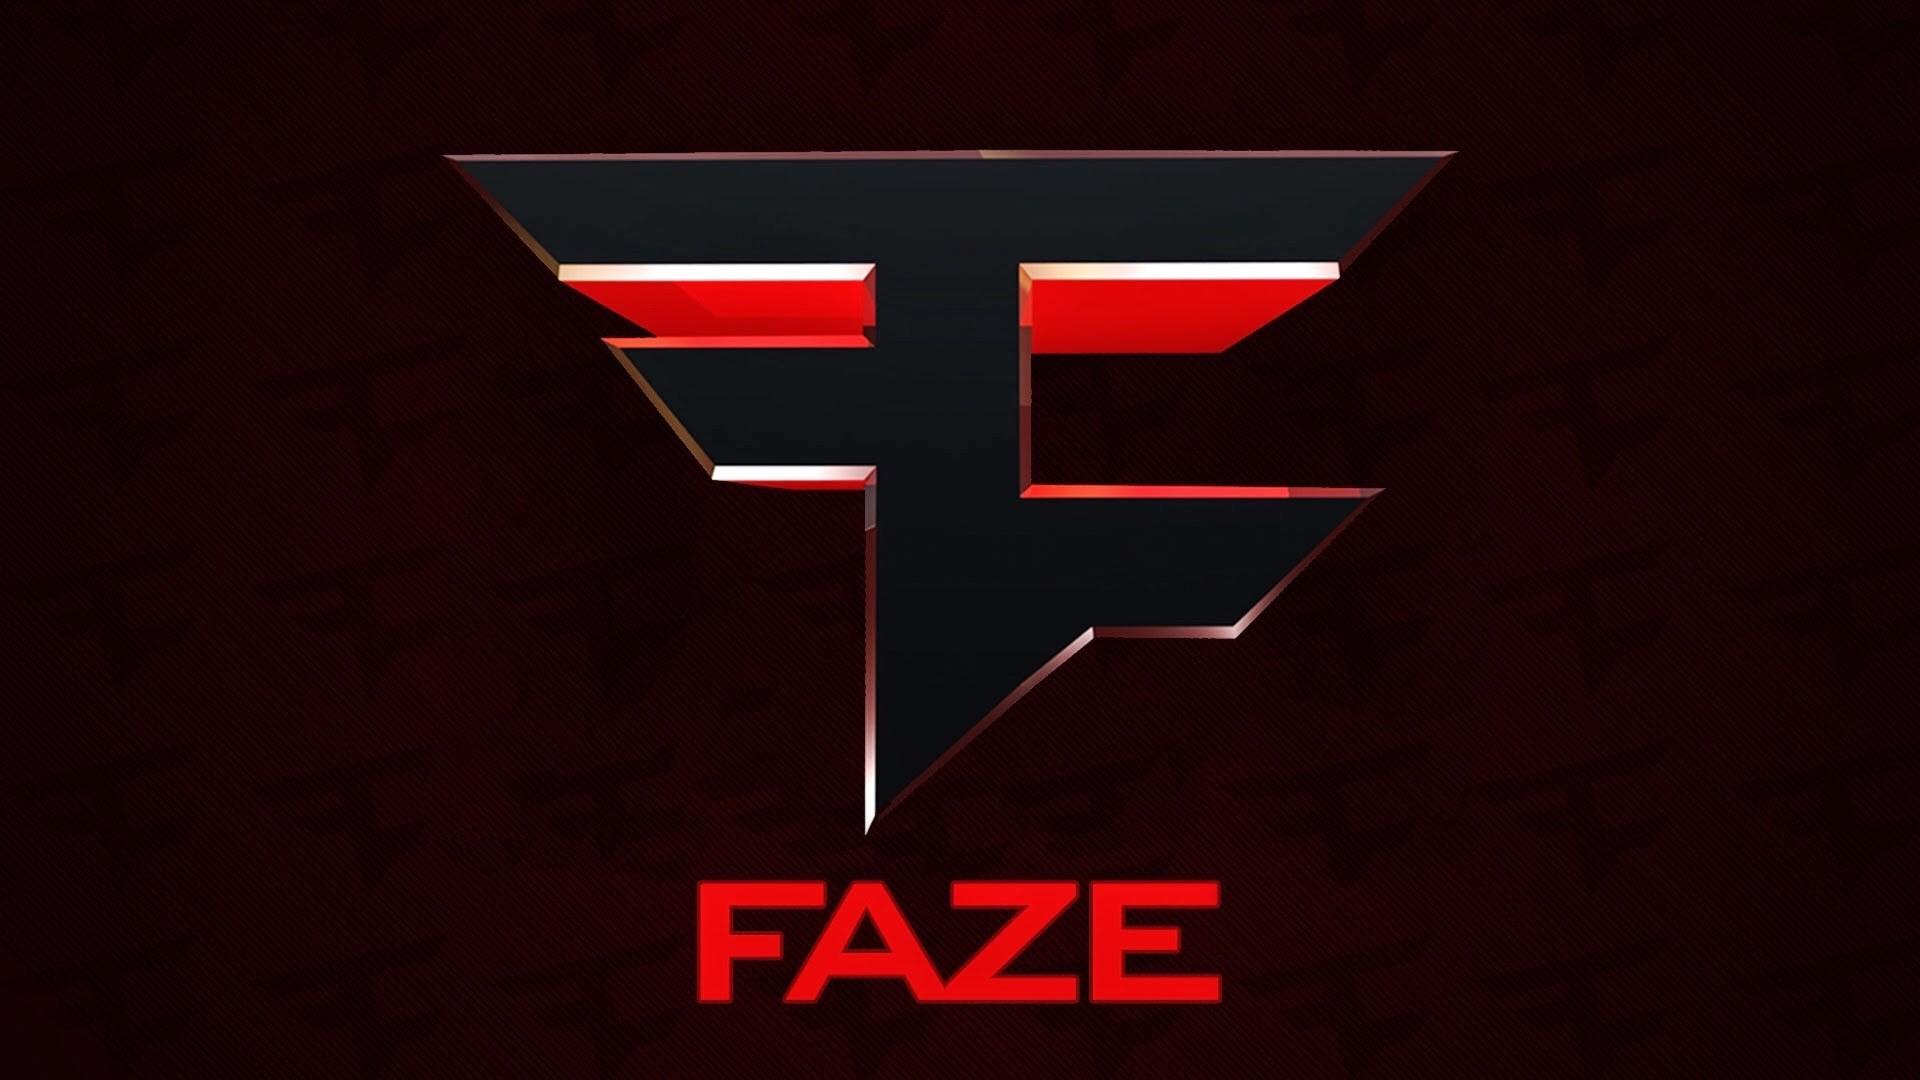 Faze Clan 1080p Wallpaper 91 Images